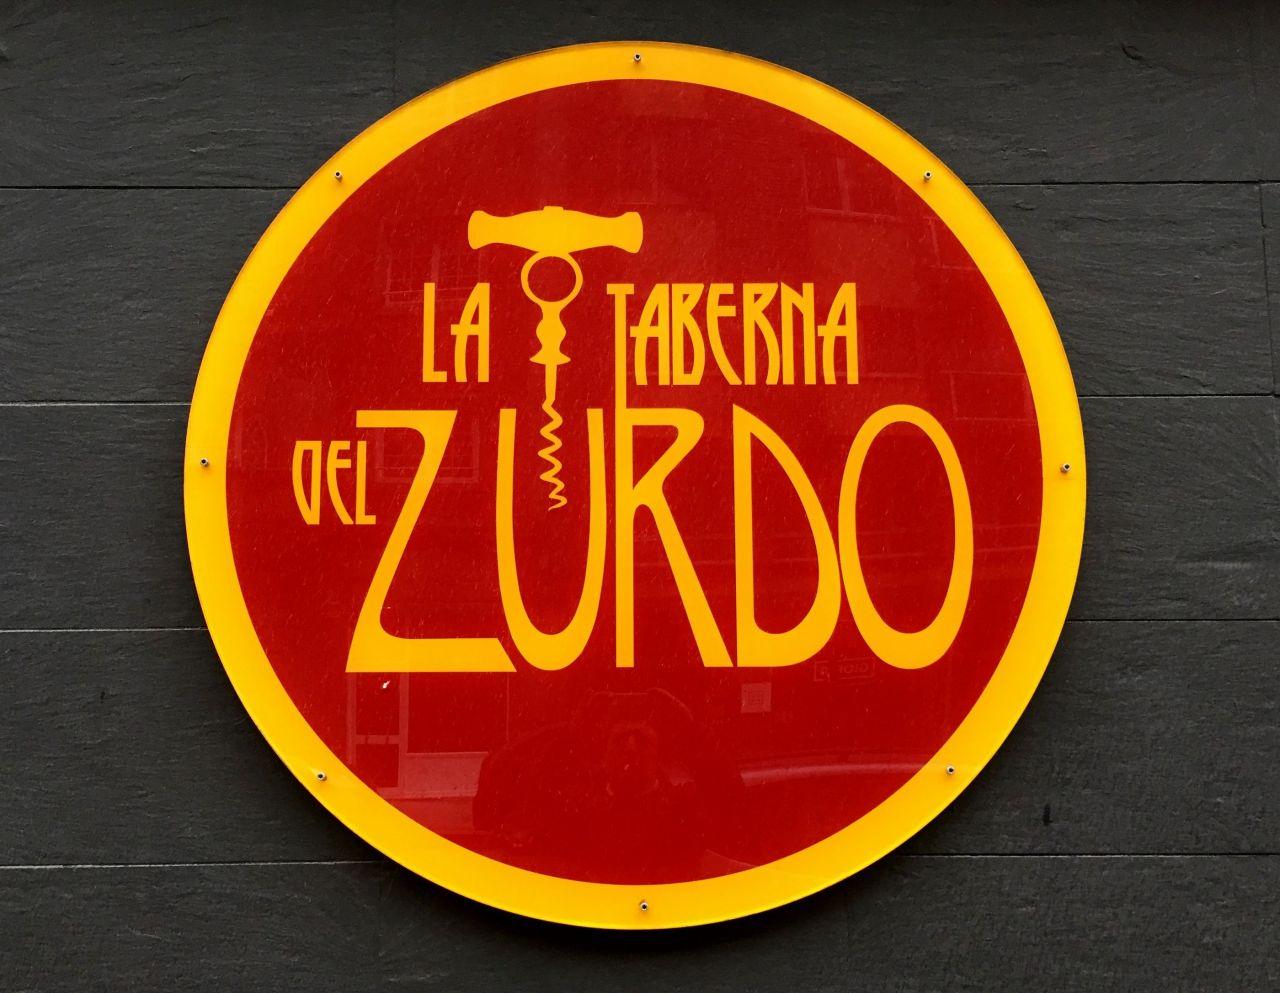 La Taberna delZurdo